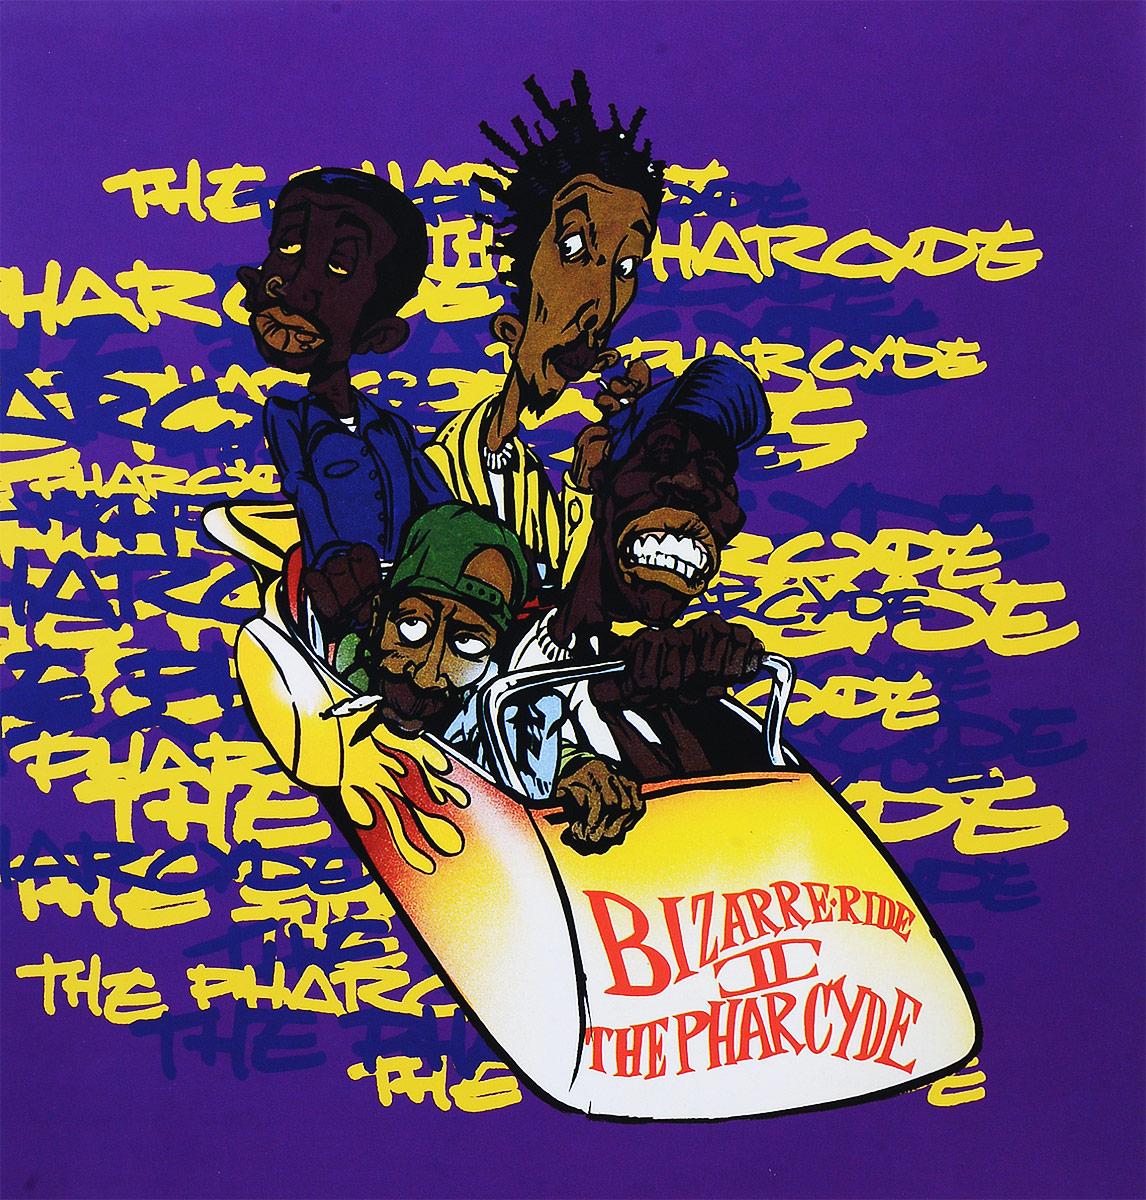 The Pharcyde Pharcyde. The Bizarre Ride II The Pharcyde (5 LP) pharcyde pharcyde labcabincalifornia 2 lp